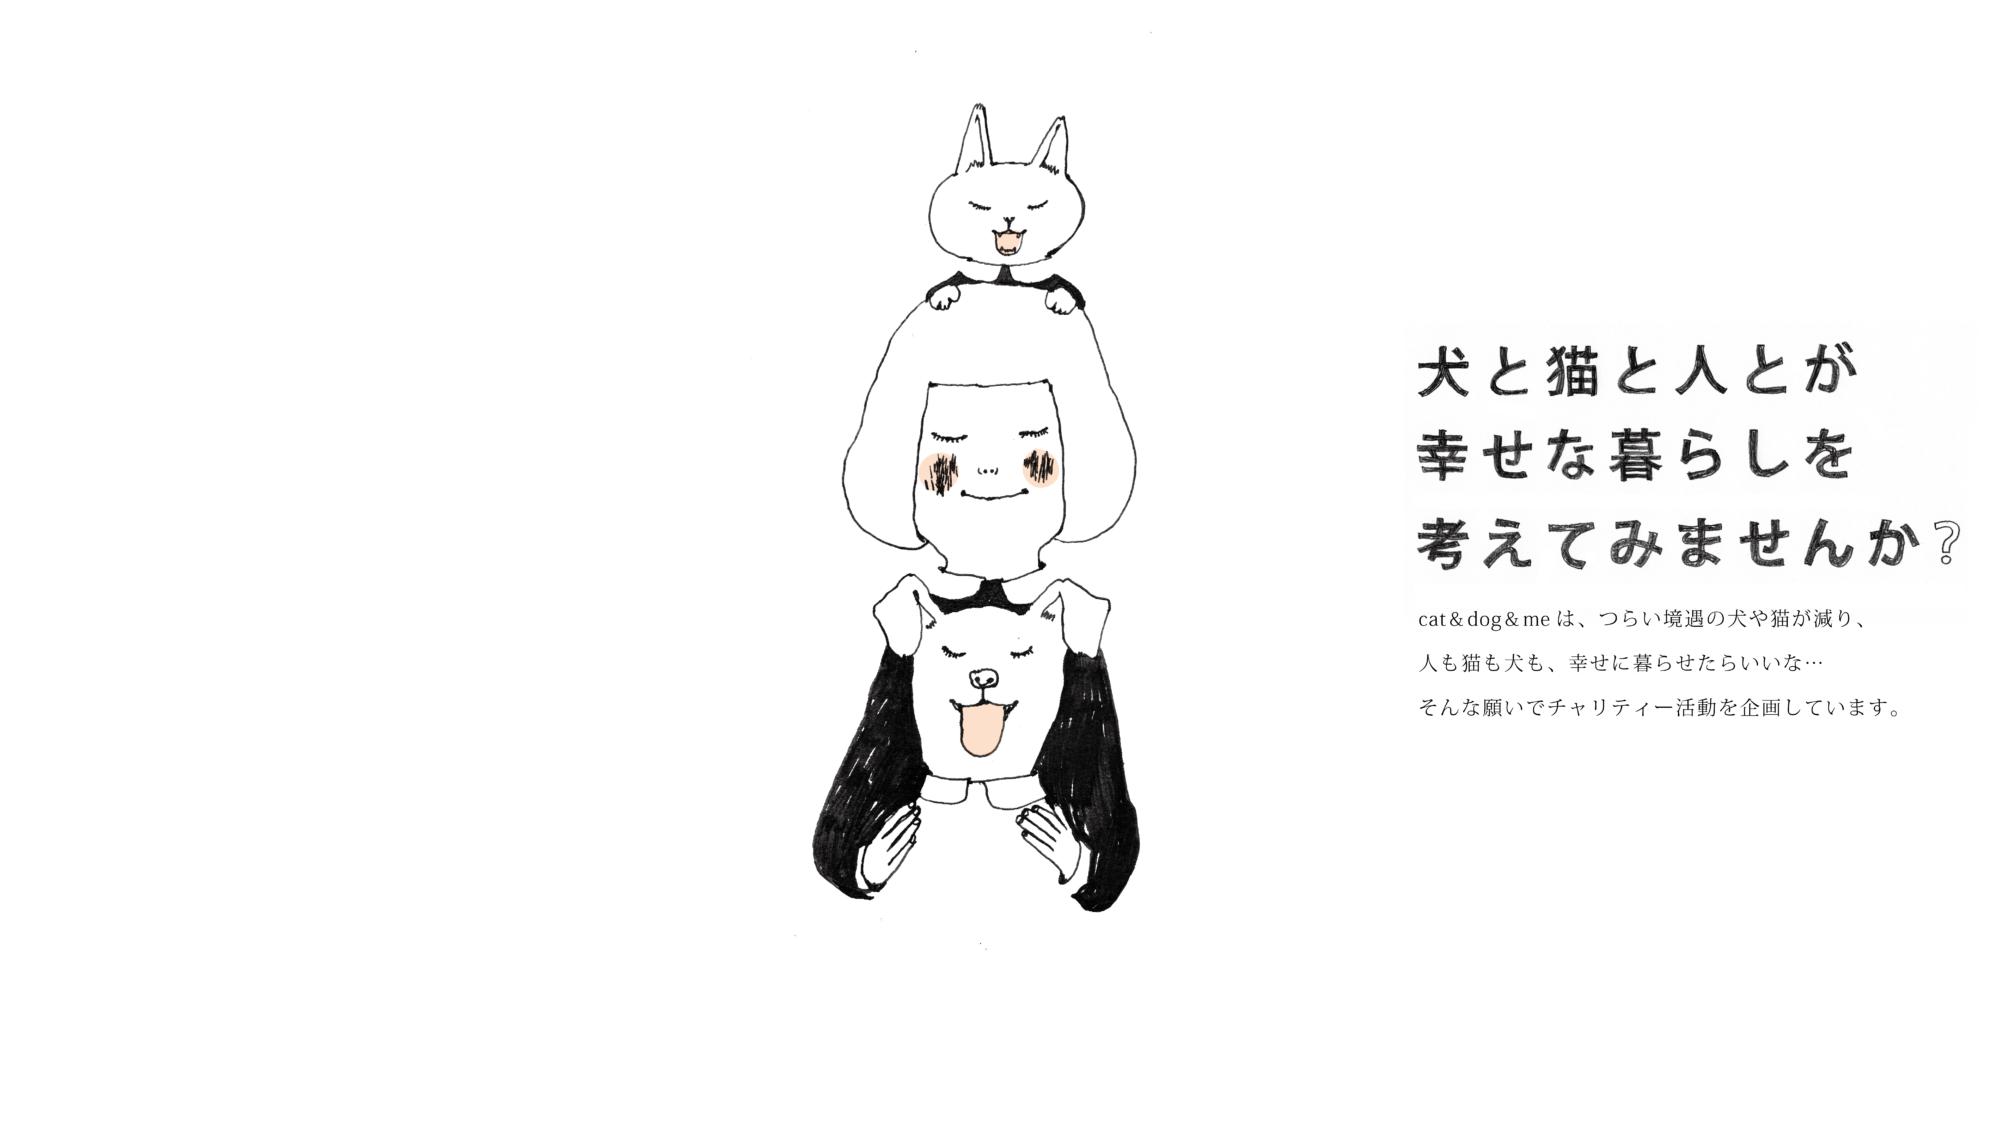 cat&dog&me